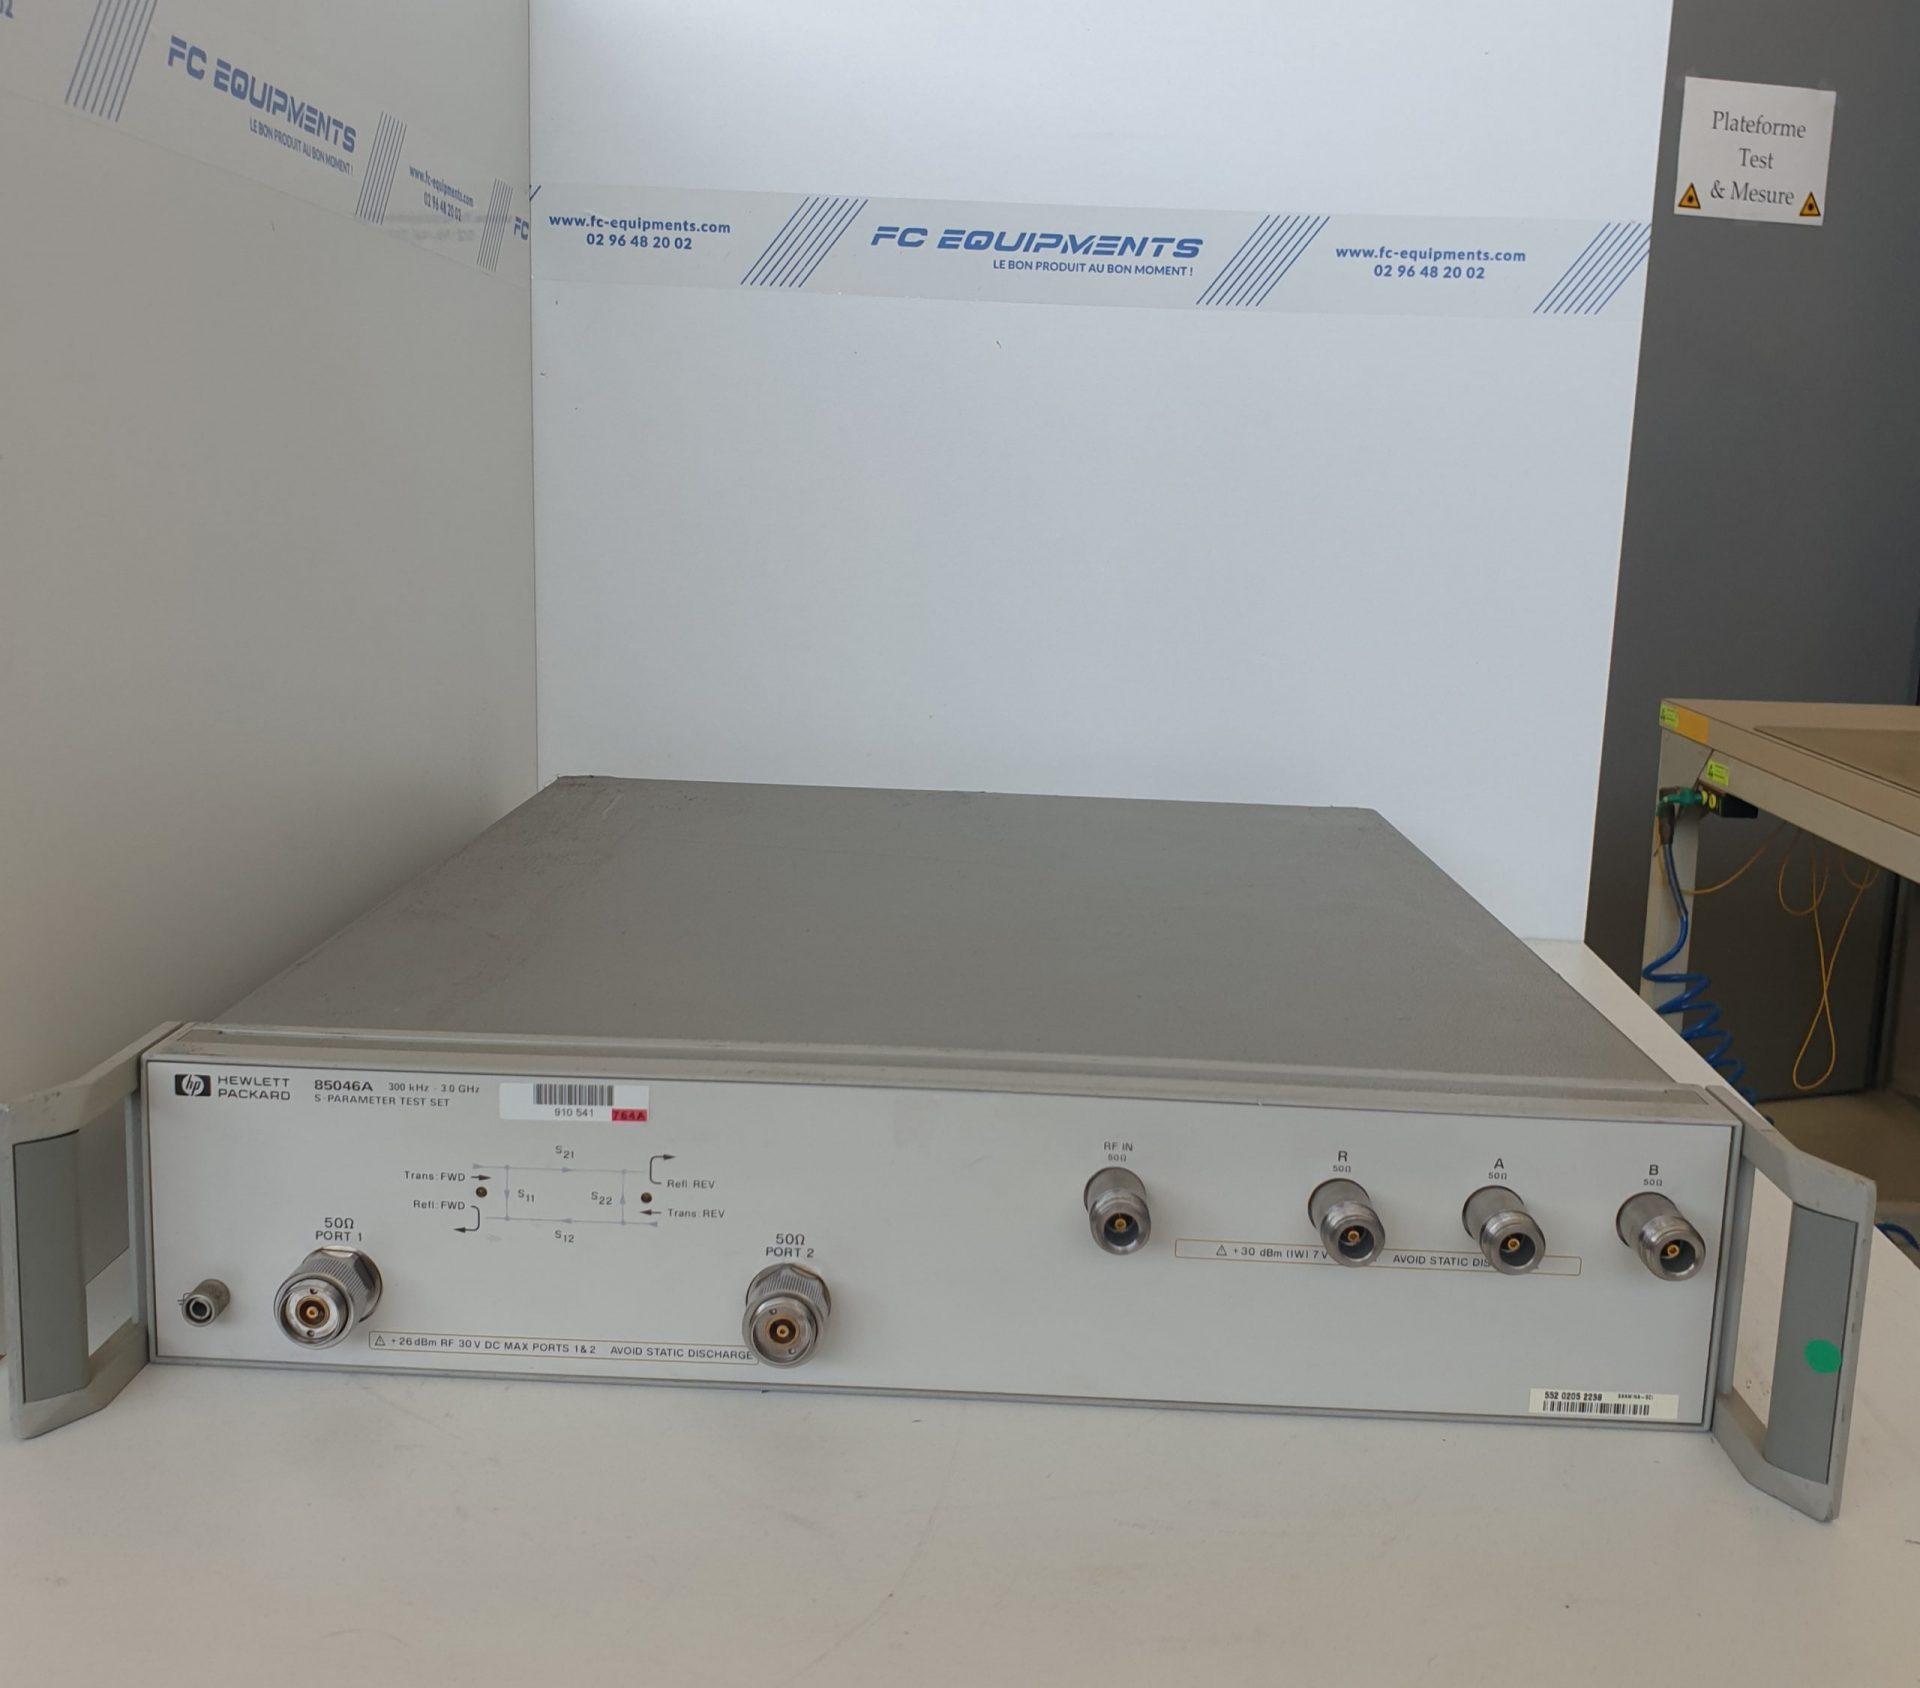 S-PARAMETER TEST SET 300KHz - 3GHz - KEYSIGHT TECHNOLOGIES (AGILENT/HP)